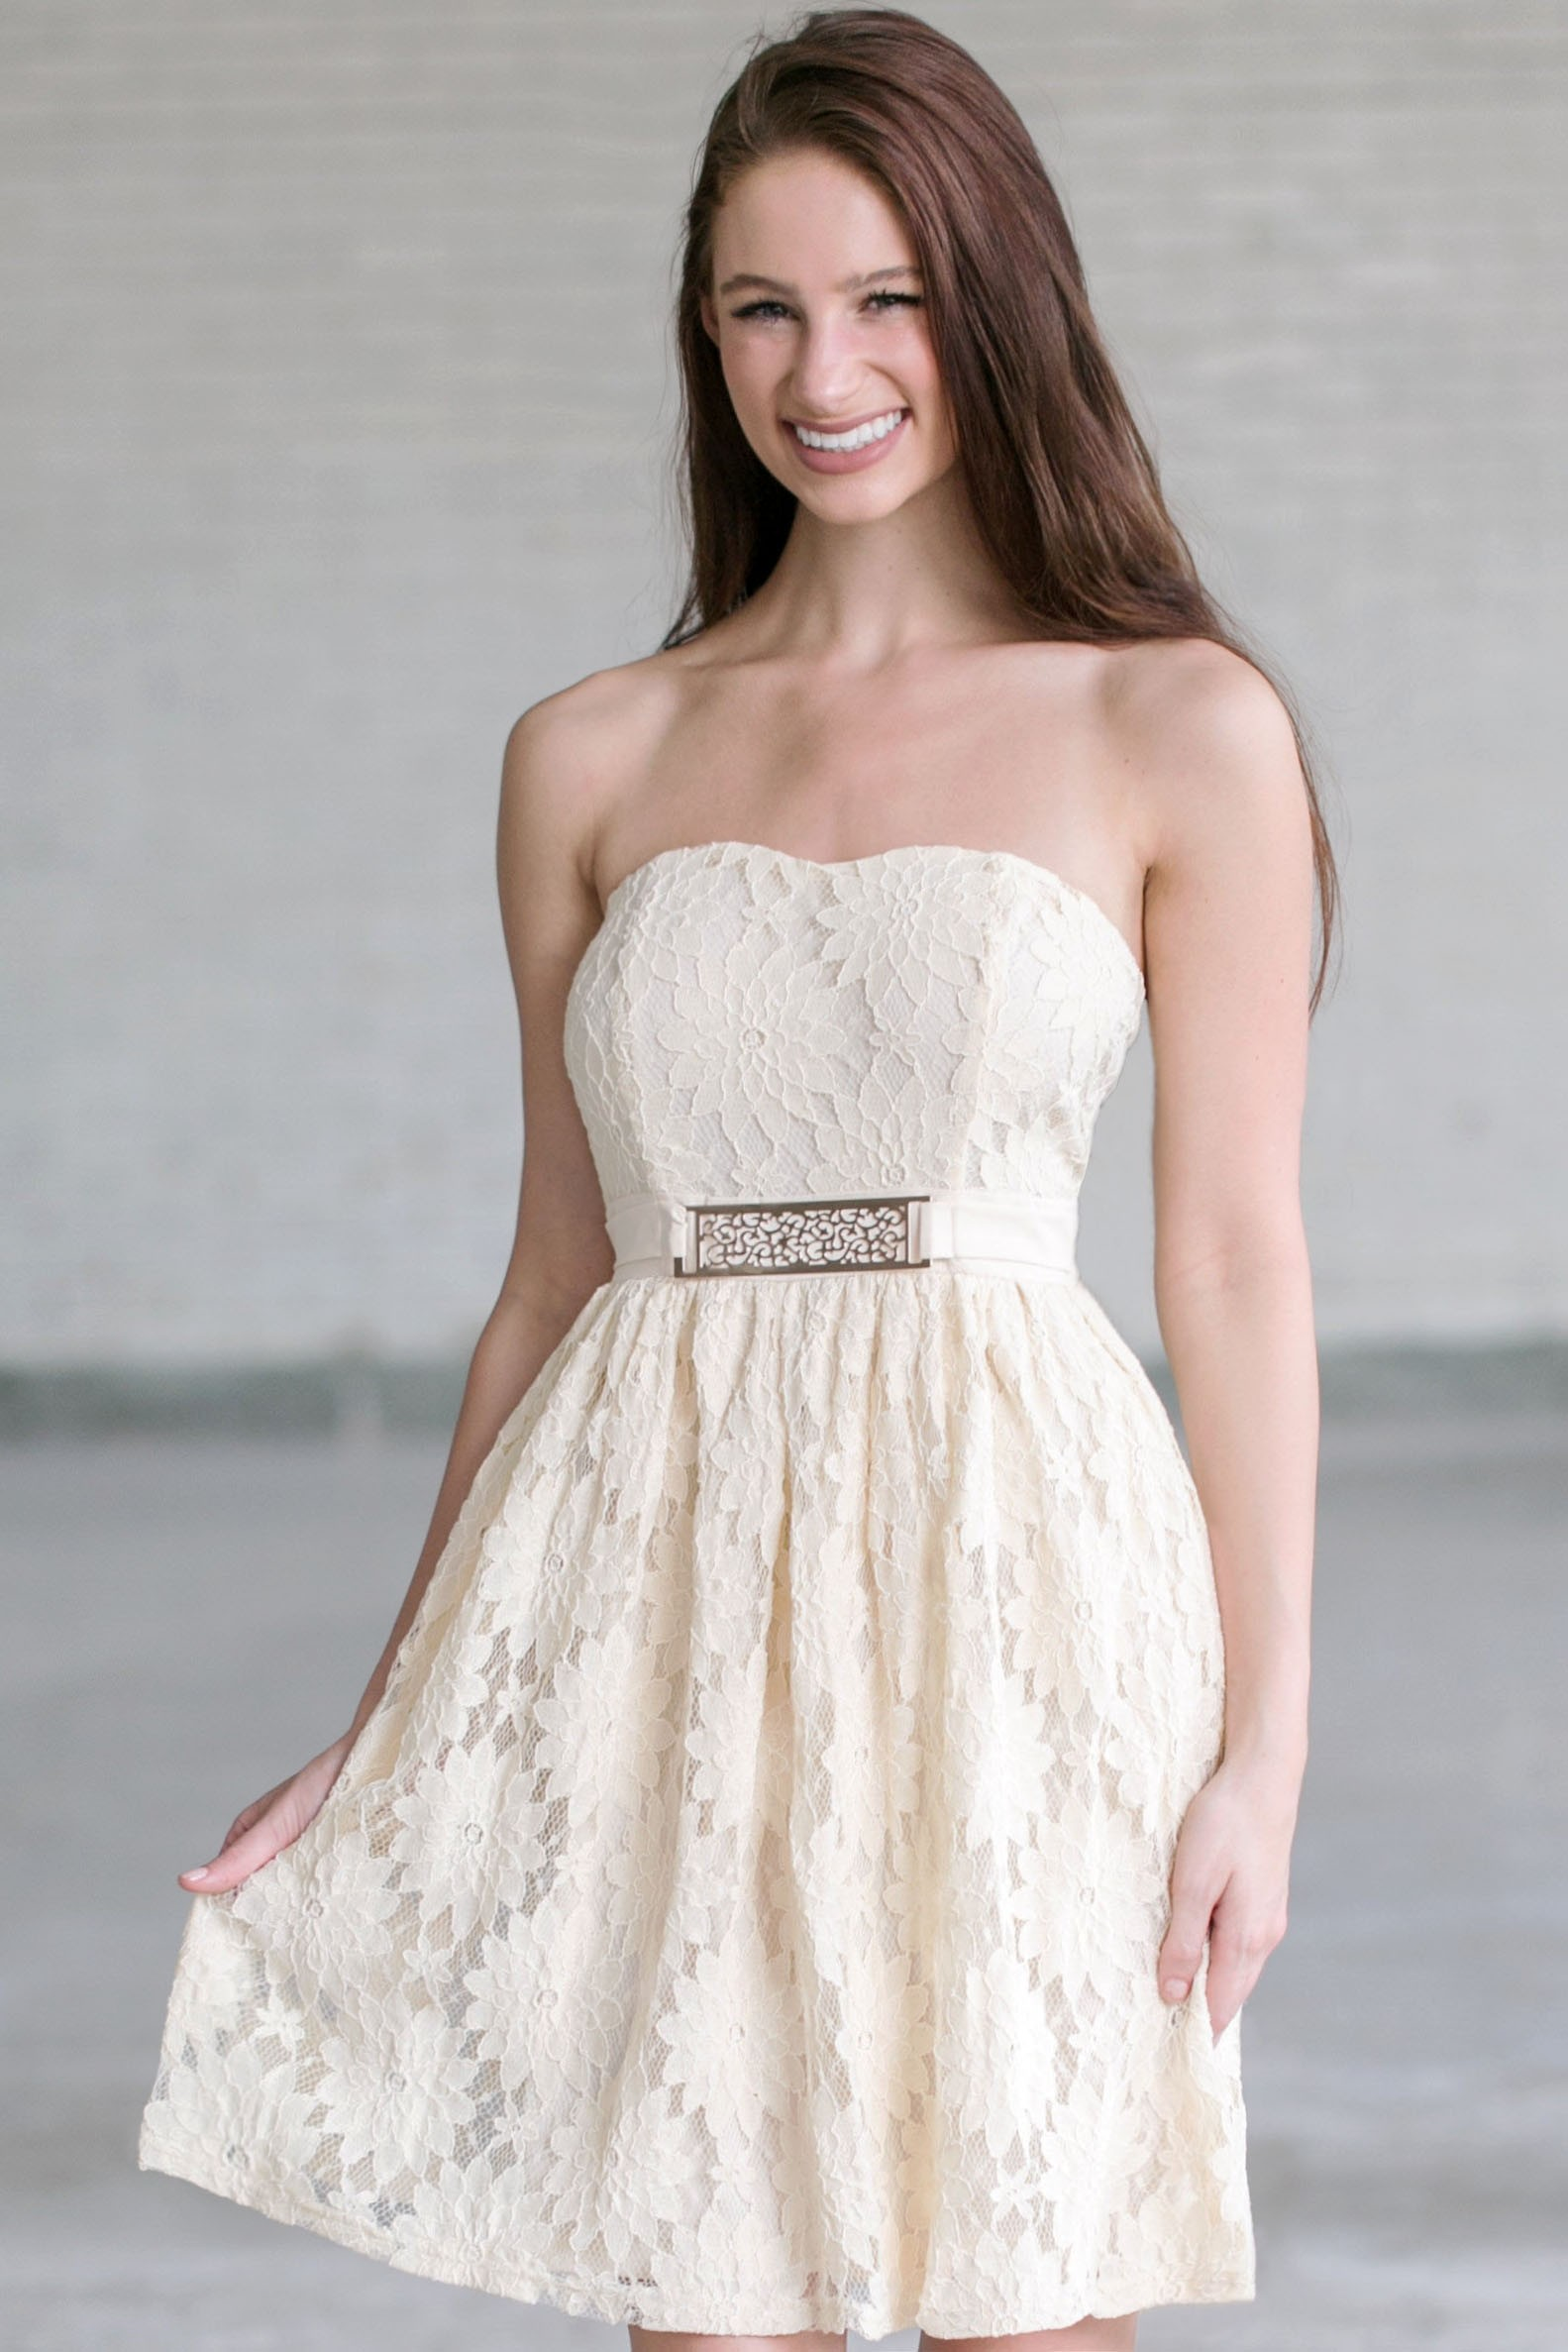 fdec228228cda Beige Strapless Lace Dress, Cute Cream Lace Dress Online, Rehearsal Dinner  Dress, Bridal Shower Dress Lily Boutique